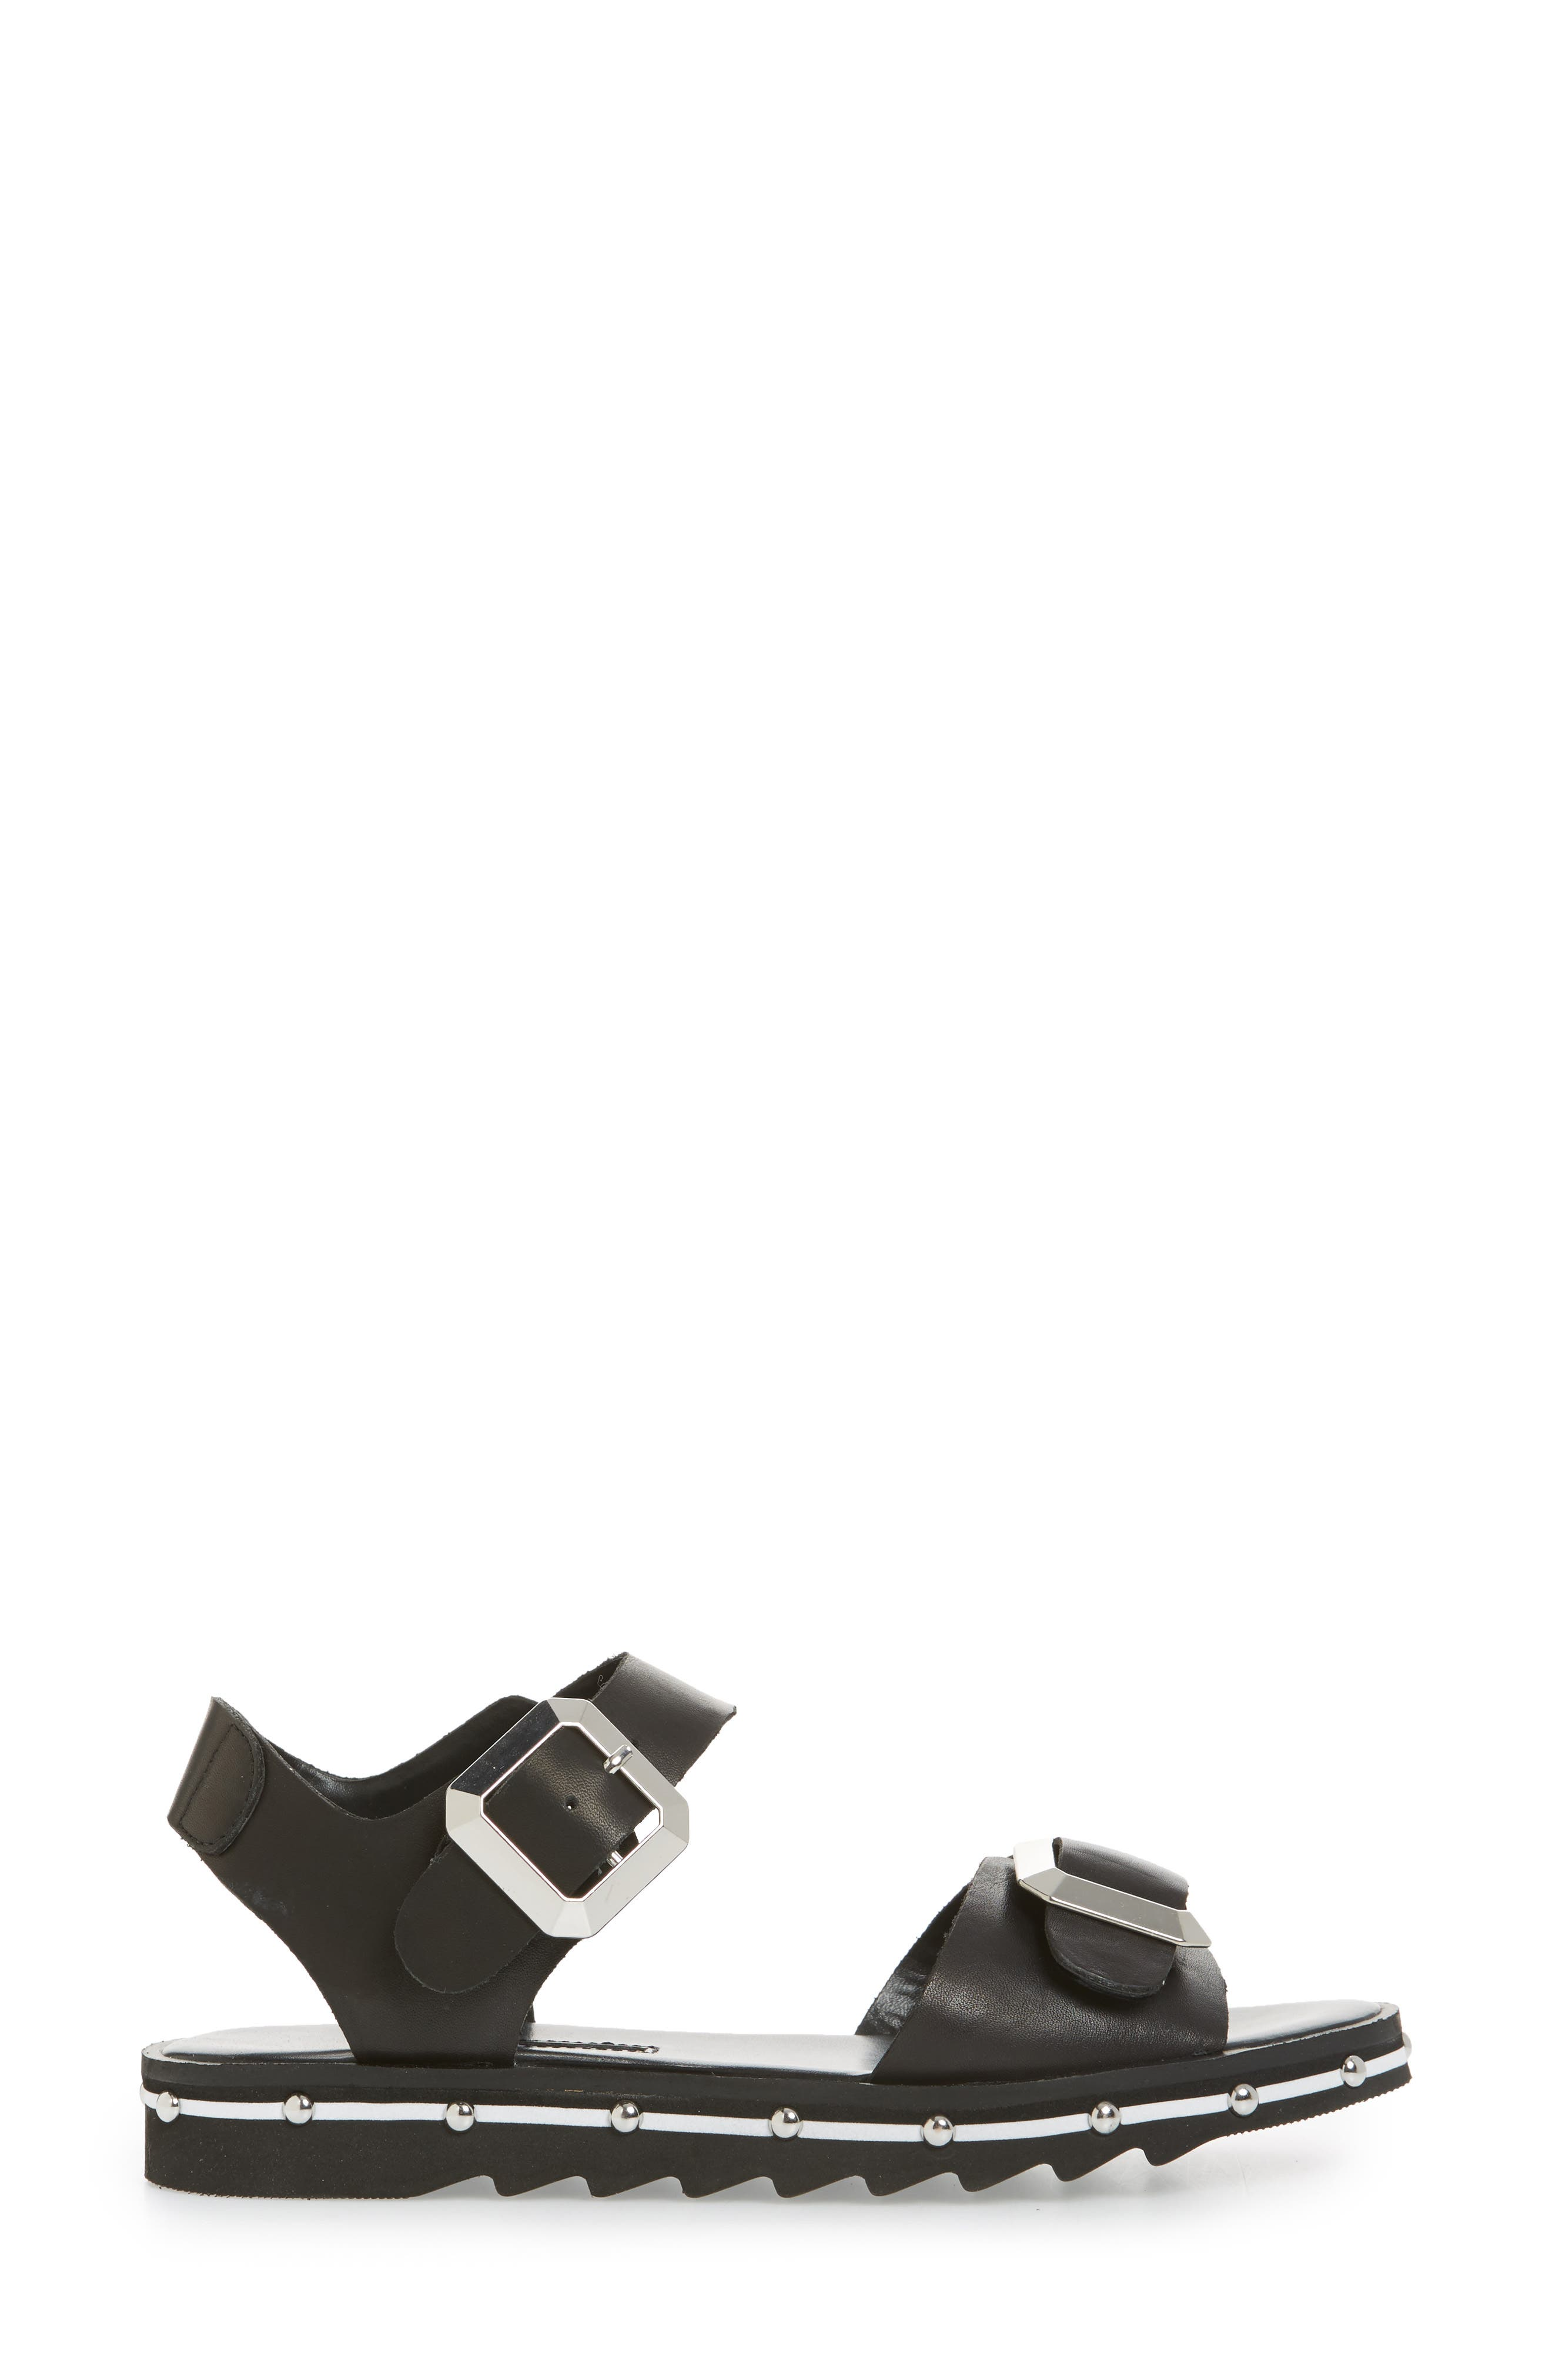 Spy Sandal,                             Alternate thumbnail 3, color,                             Black Leather